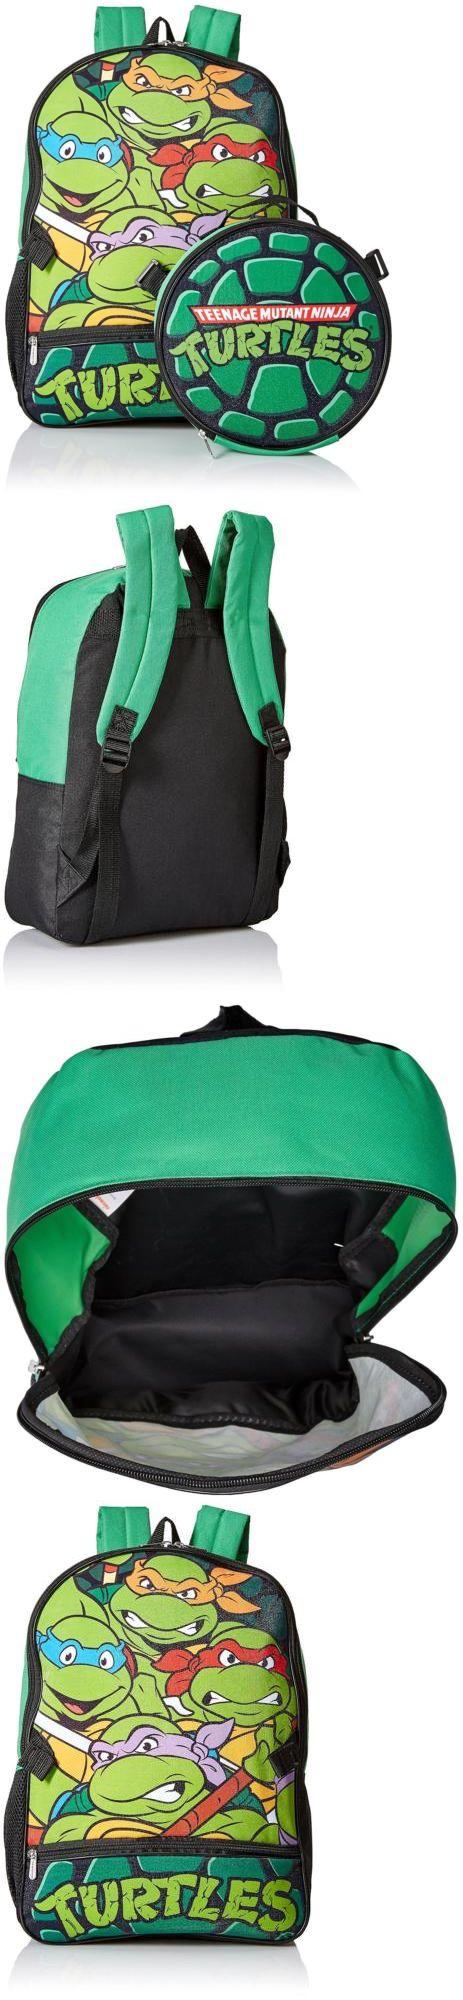 Backpacks and Bags 57882: Boys School Backpack Bookbag Teenage Mutant Ninja Turtles Lunch Box Green New -> BUY IT NOW ONLY: $44.14 on eBay!